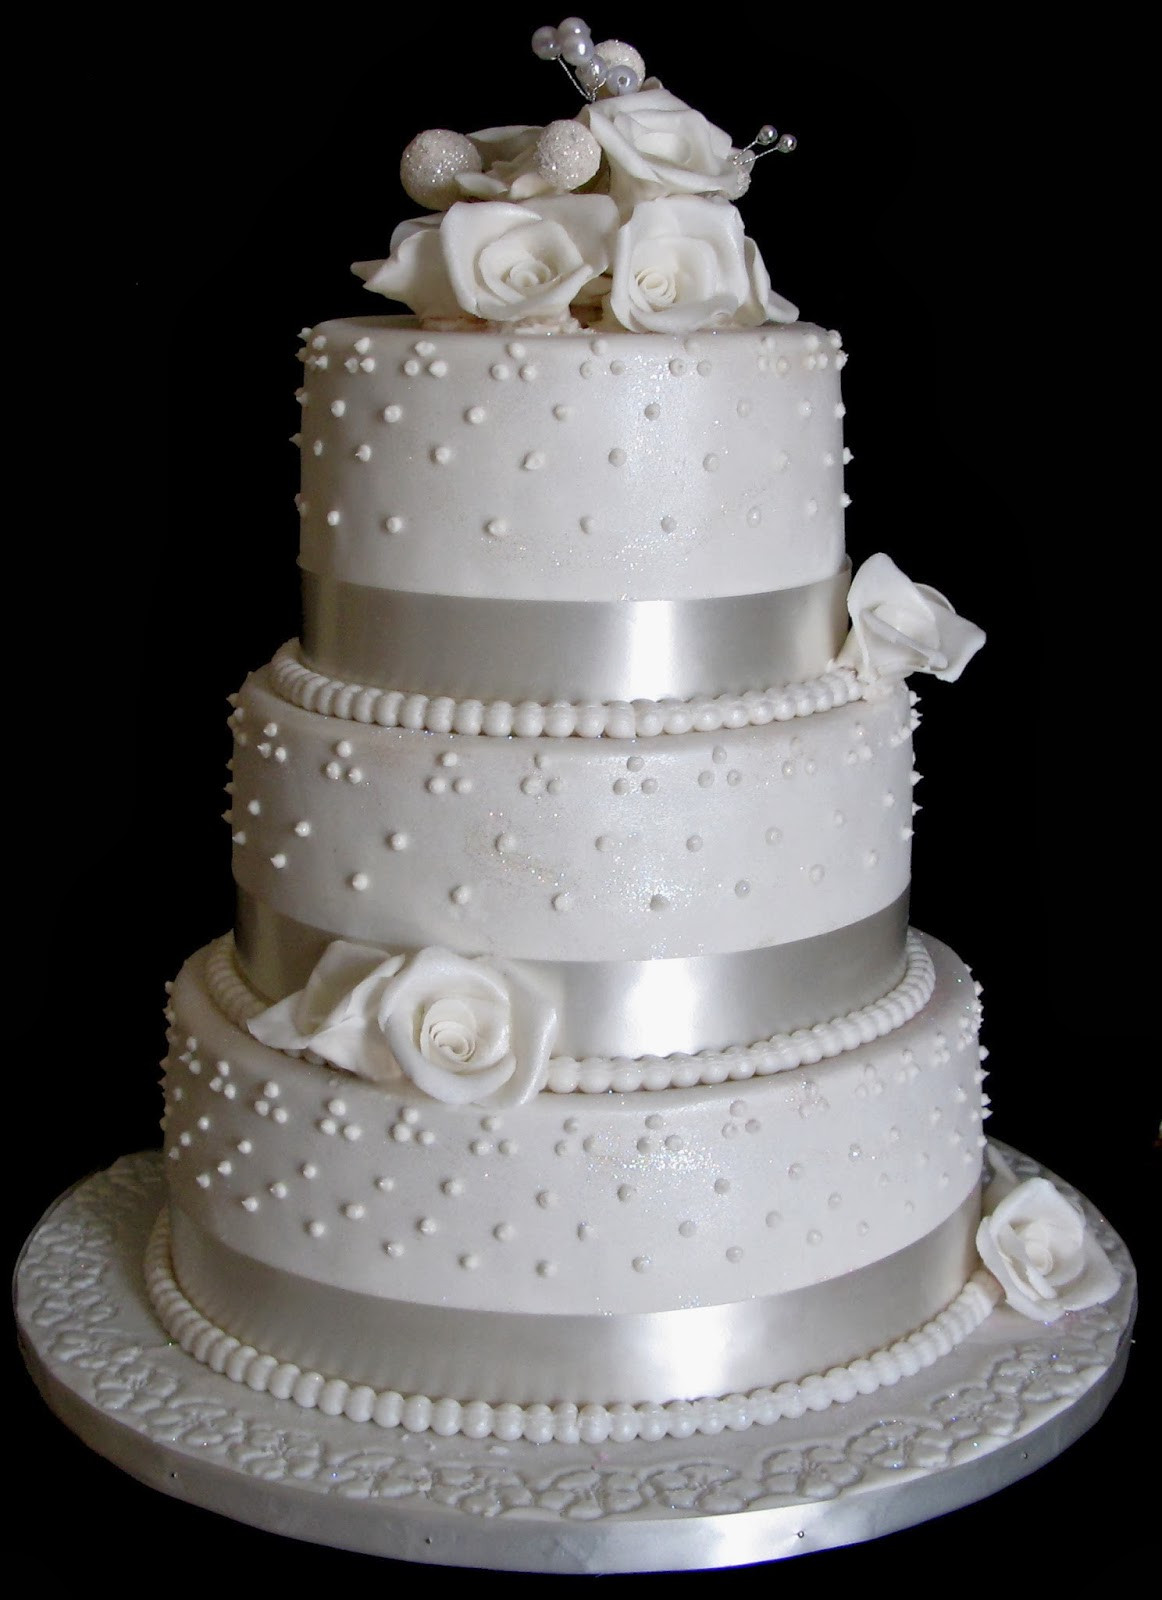 Wedding Cakes Layers  Sugarcraft by Soni Three Layer Wedding Cake White Roses